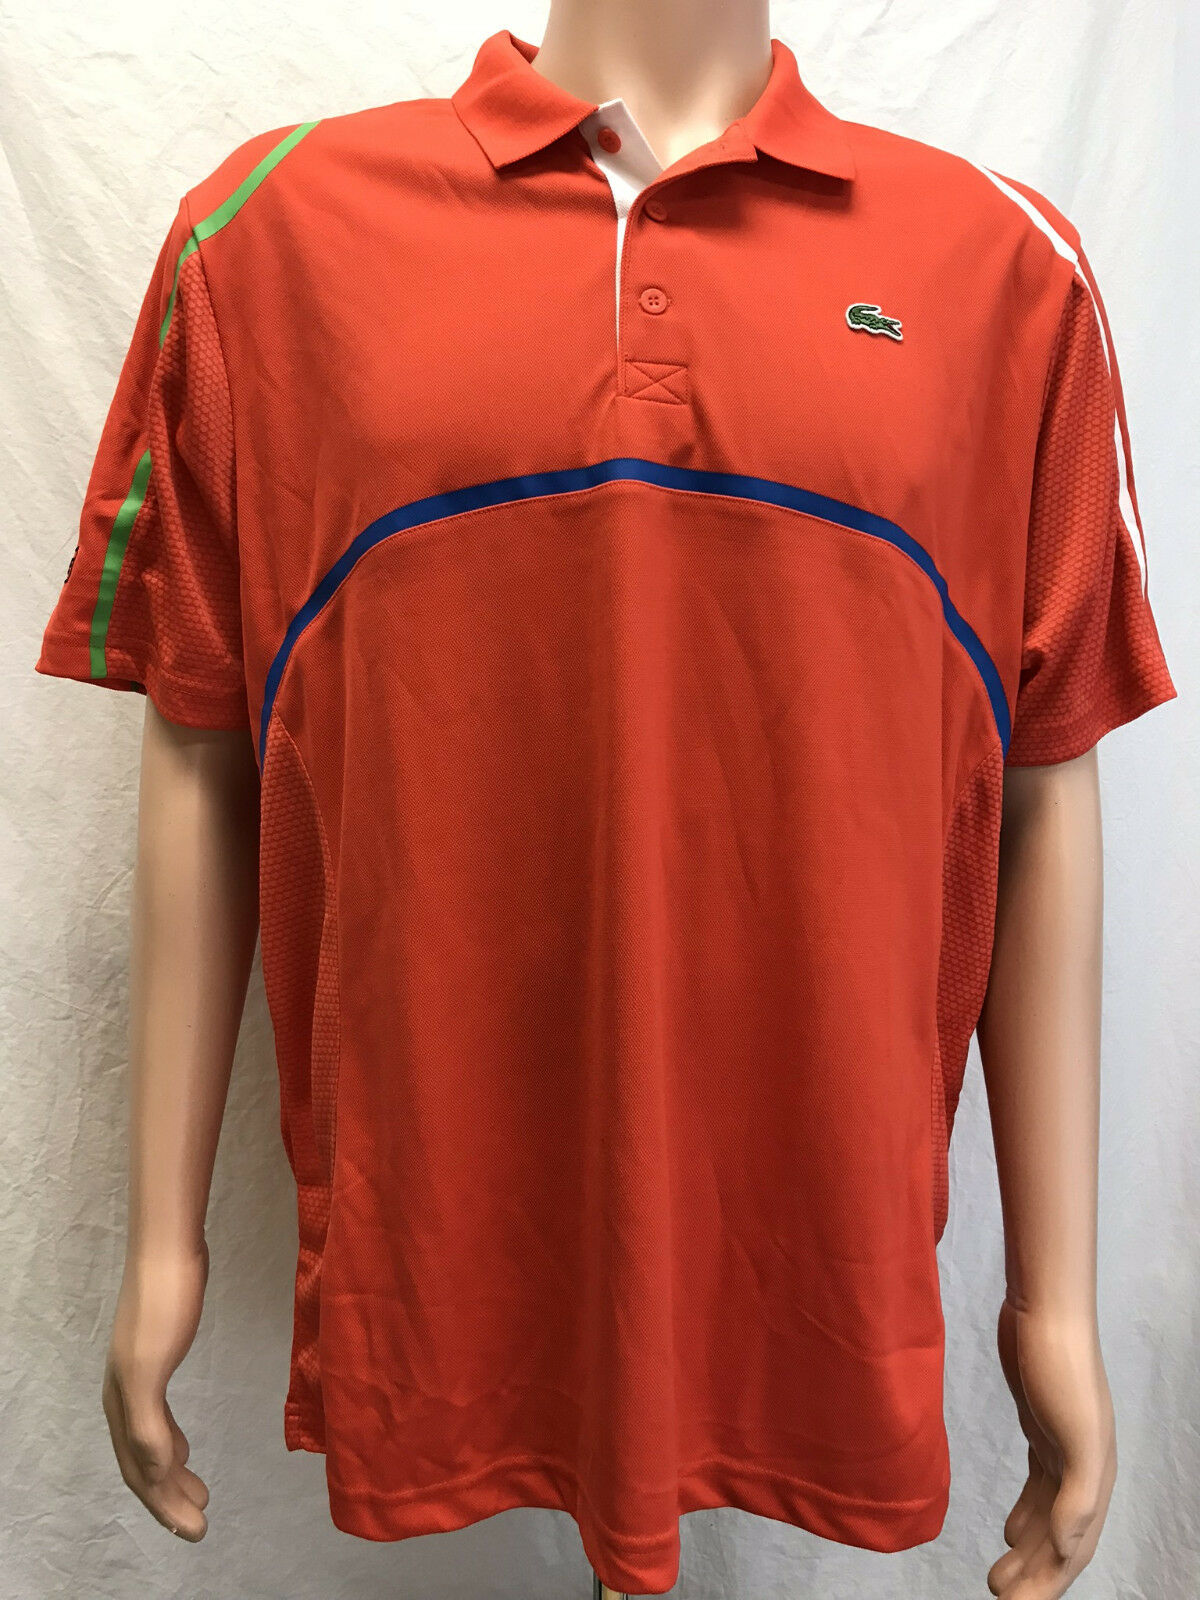 Lacoste Sports  Herren short sleeve Ultra Dry Tennis Polo Shirt DH76711, ROT, XXL